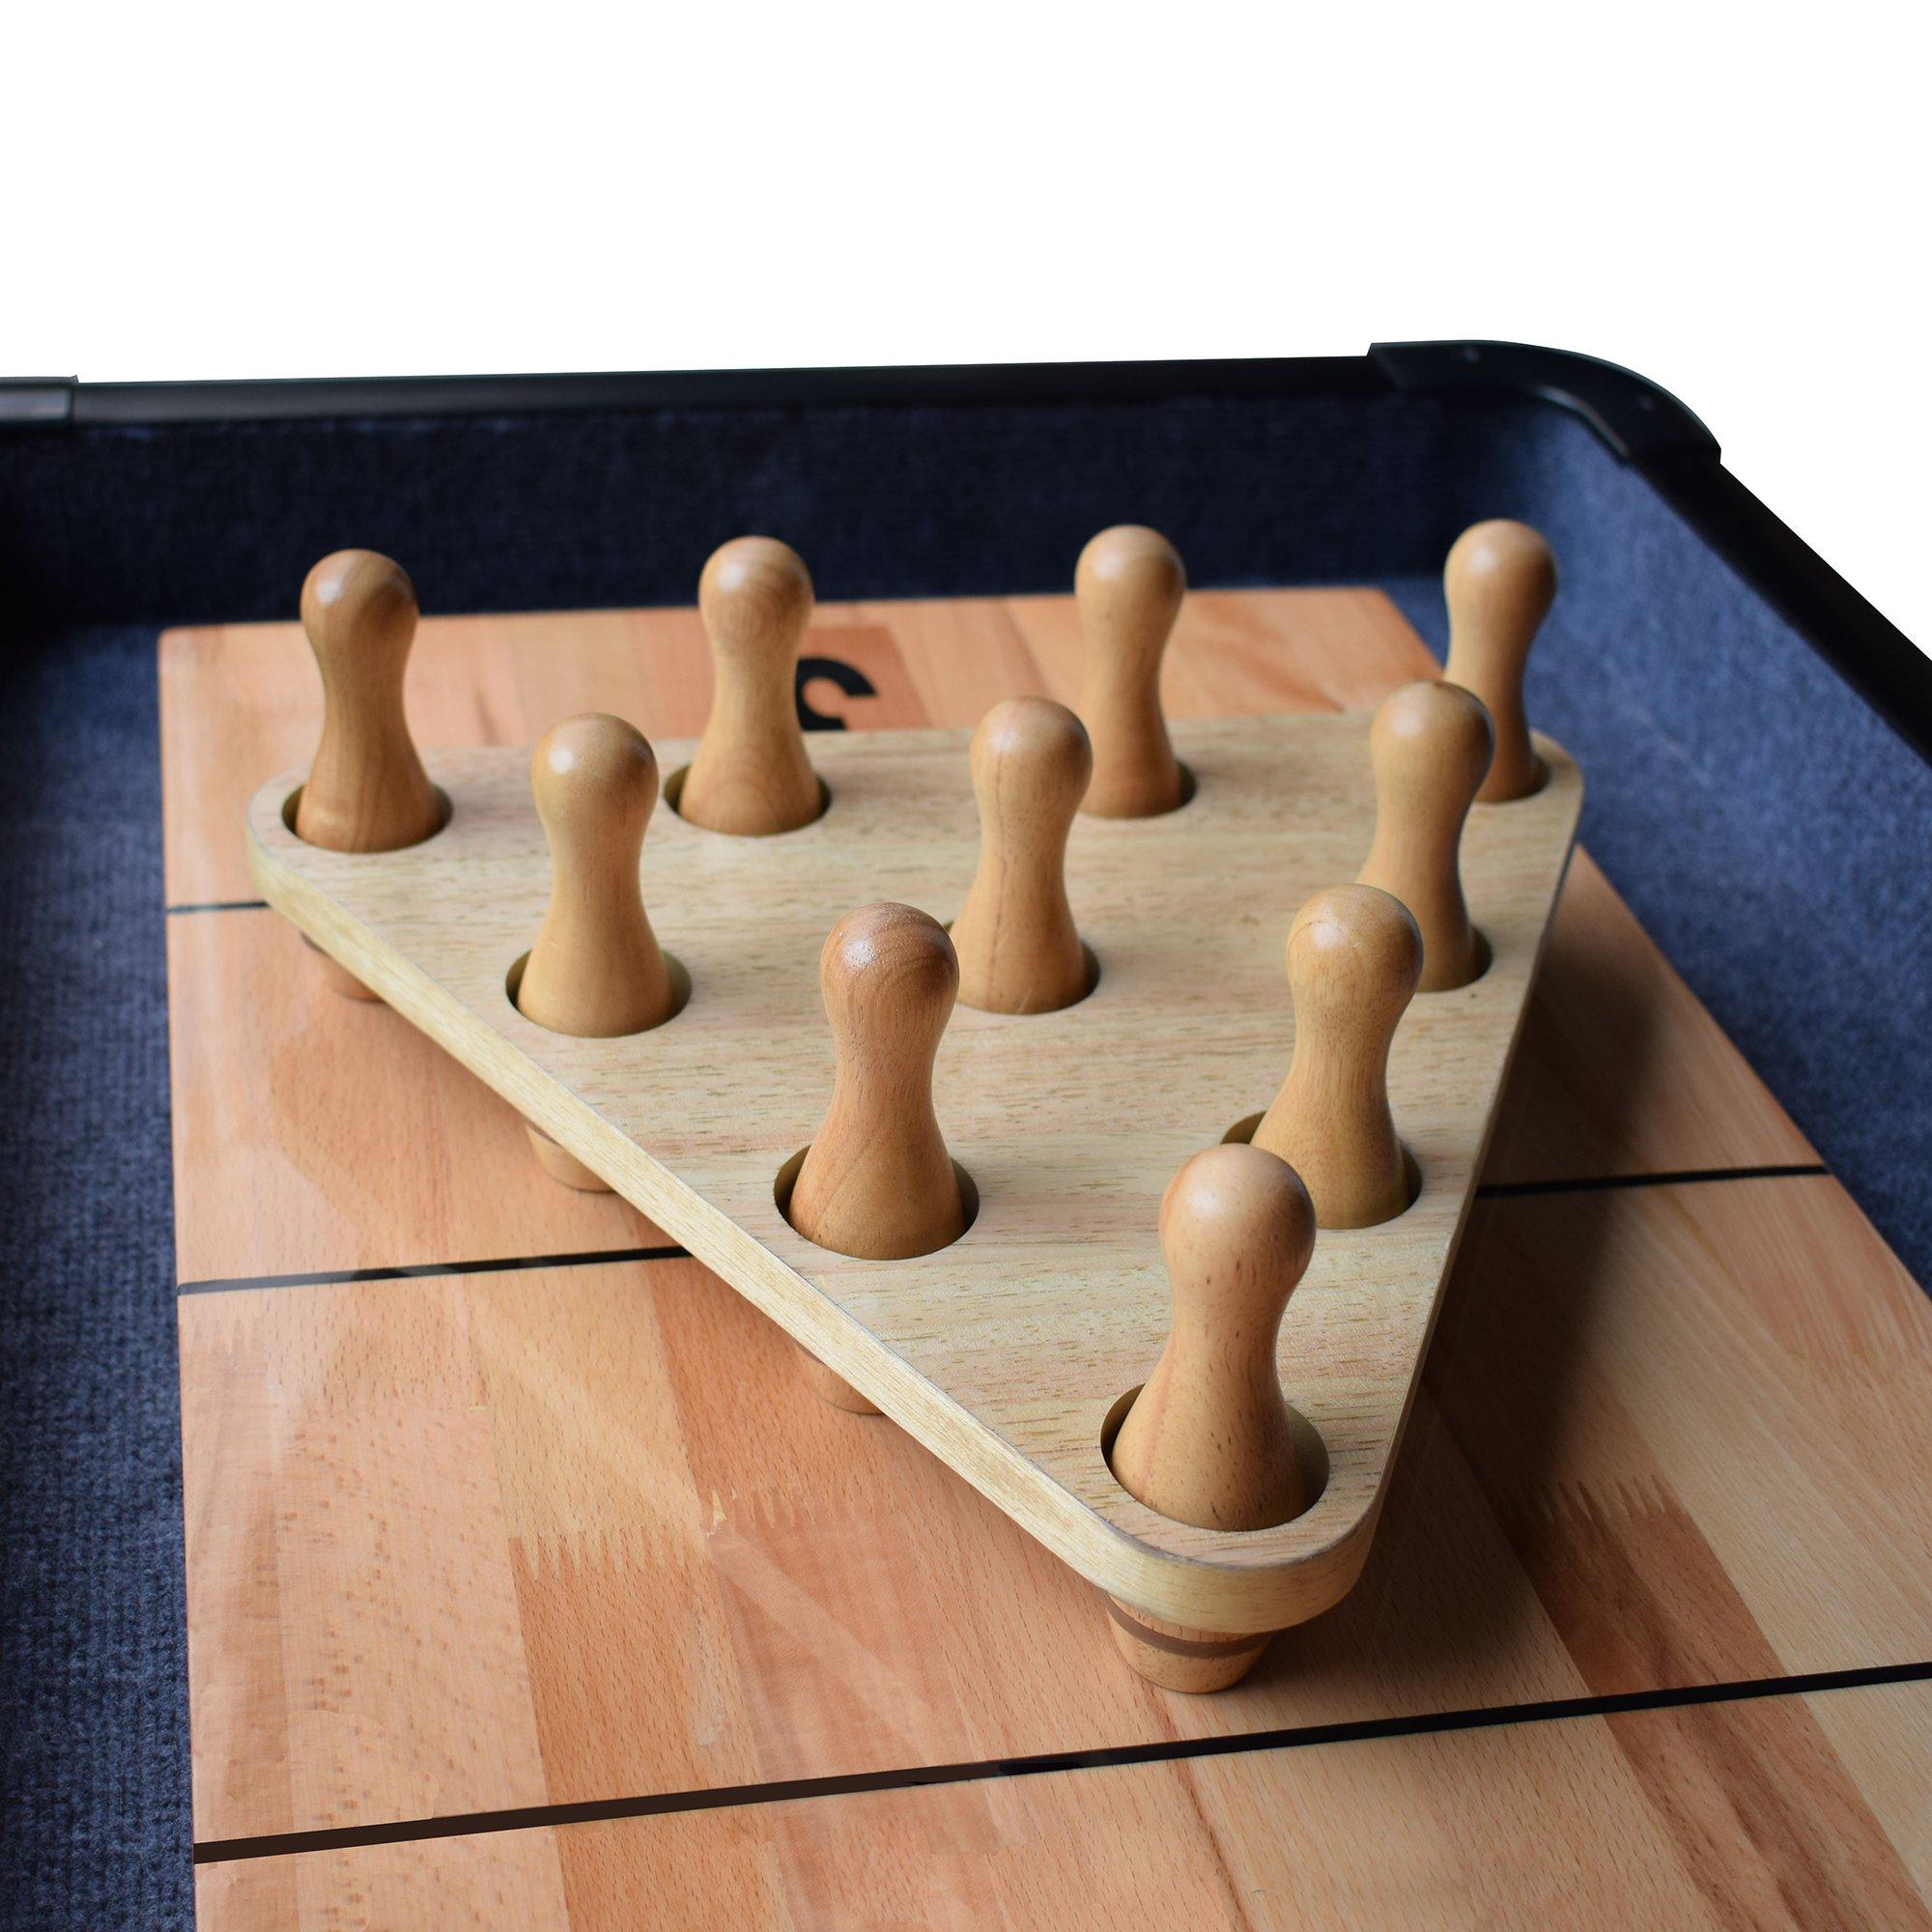 Hathaway Shuffleboard Bowling Pin Set by Hathaway